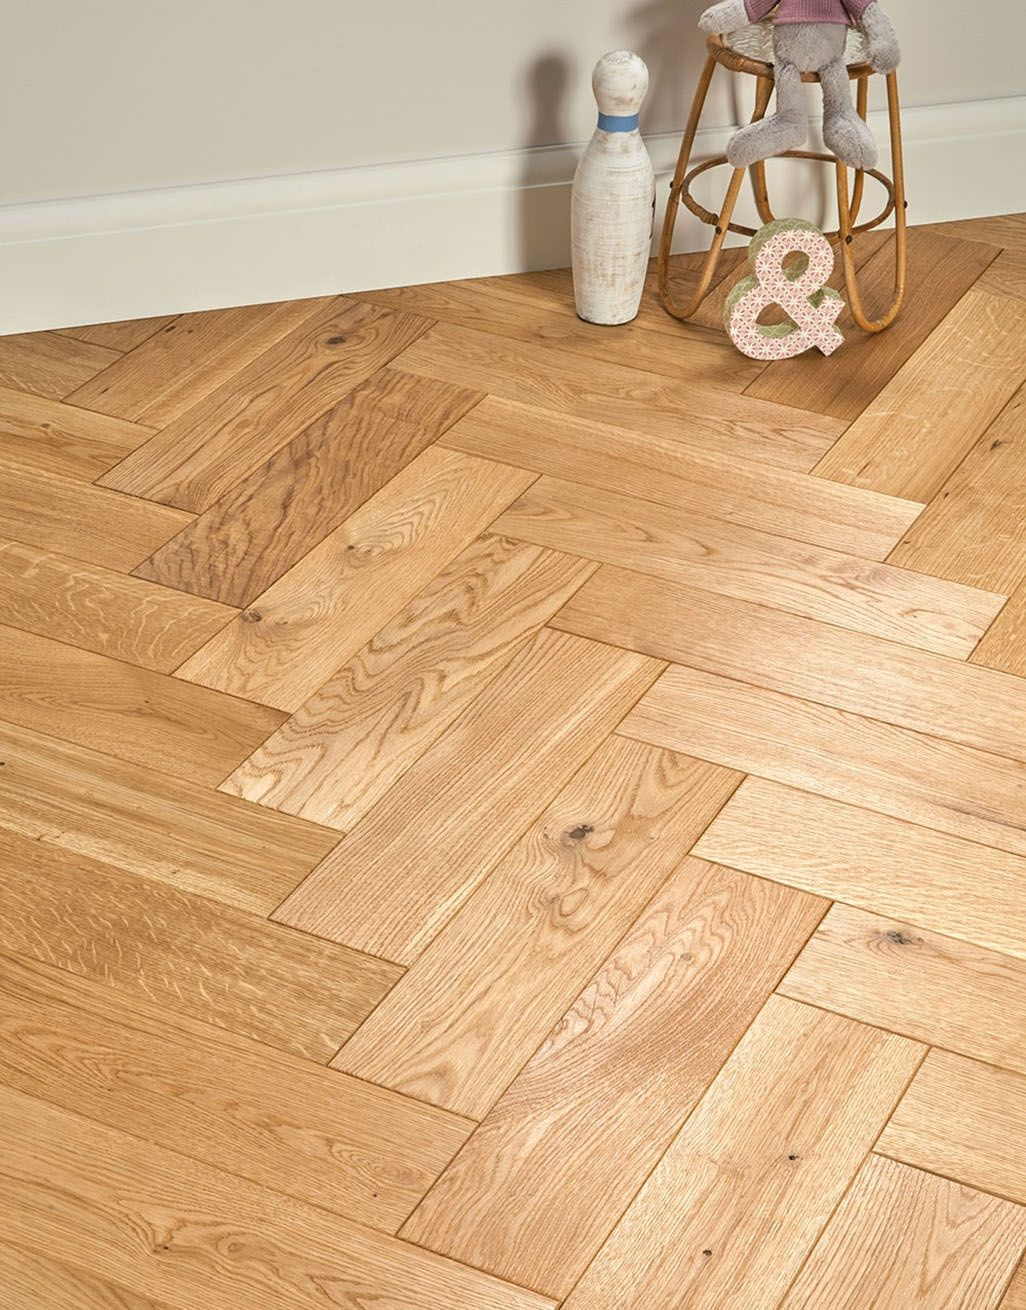 Luxury Parquet Natural Oiled Oak Solid Wood Flooring Boldinteriors Woodflooring Carpet Laminate Vinylflooring Lv Flooring Wood Floors Solid Wood Flooring